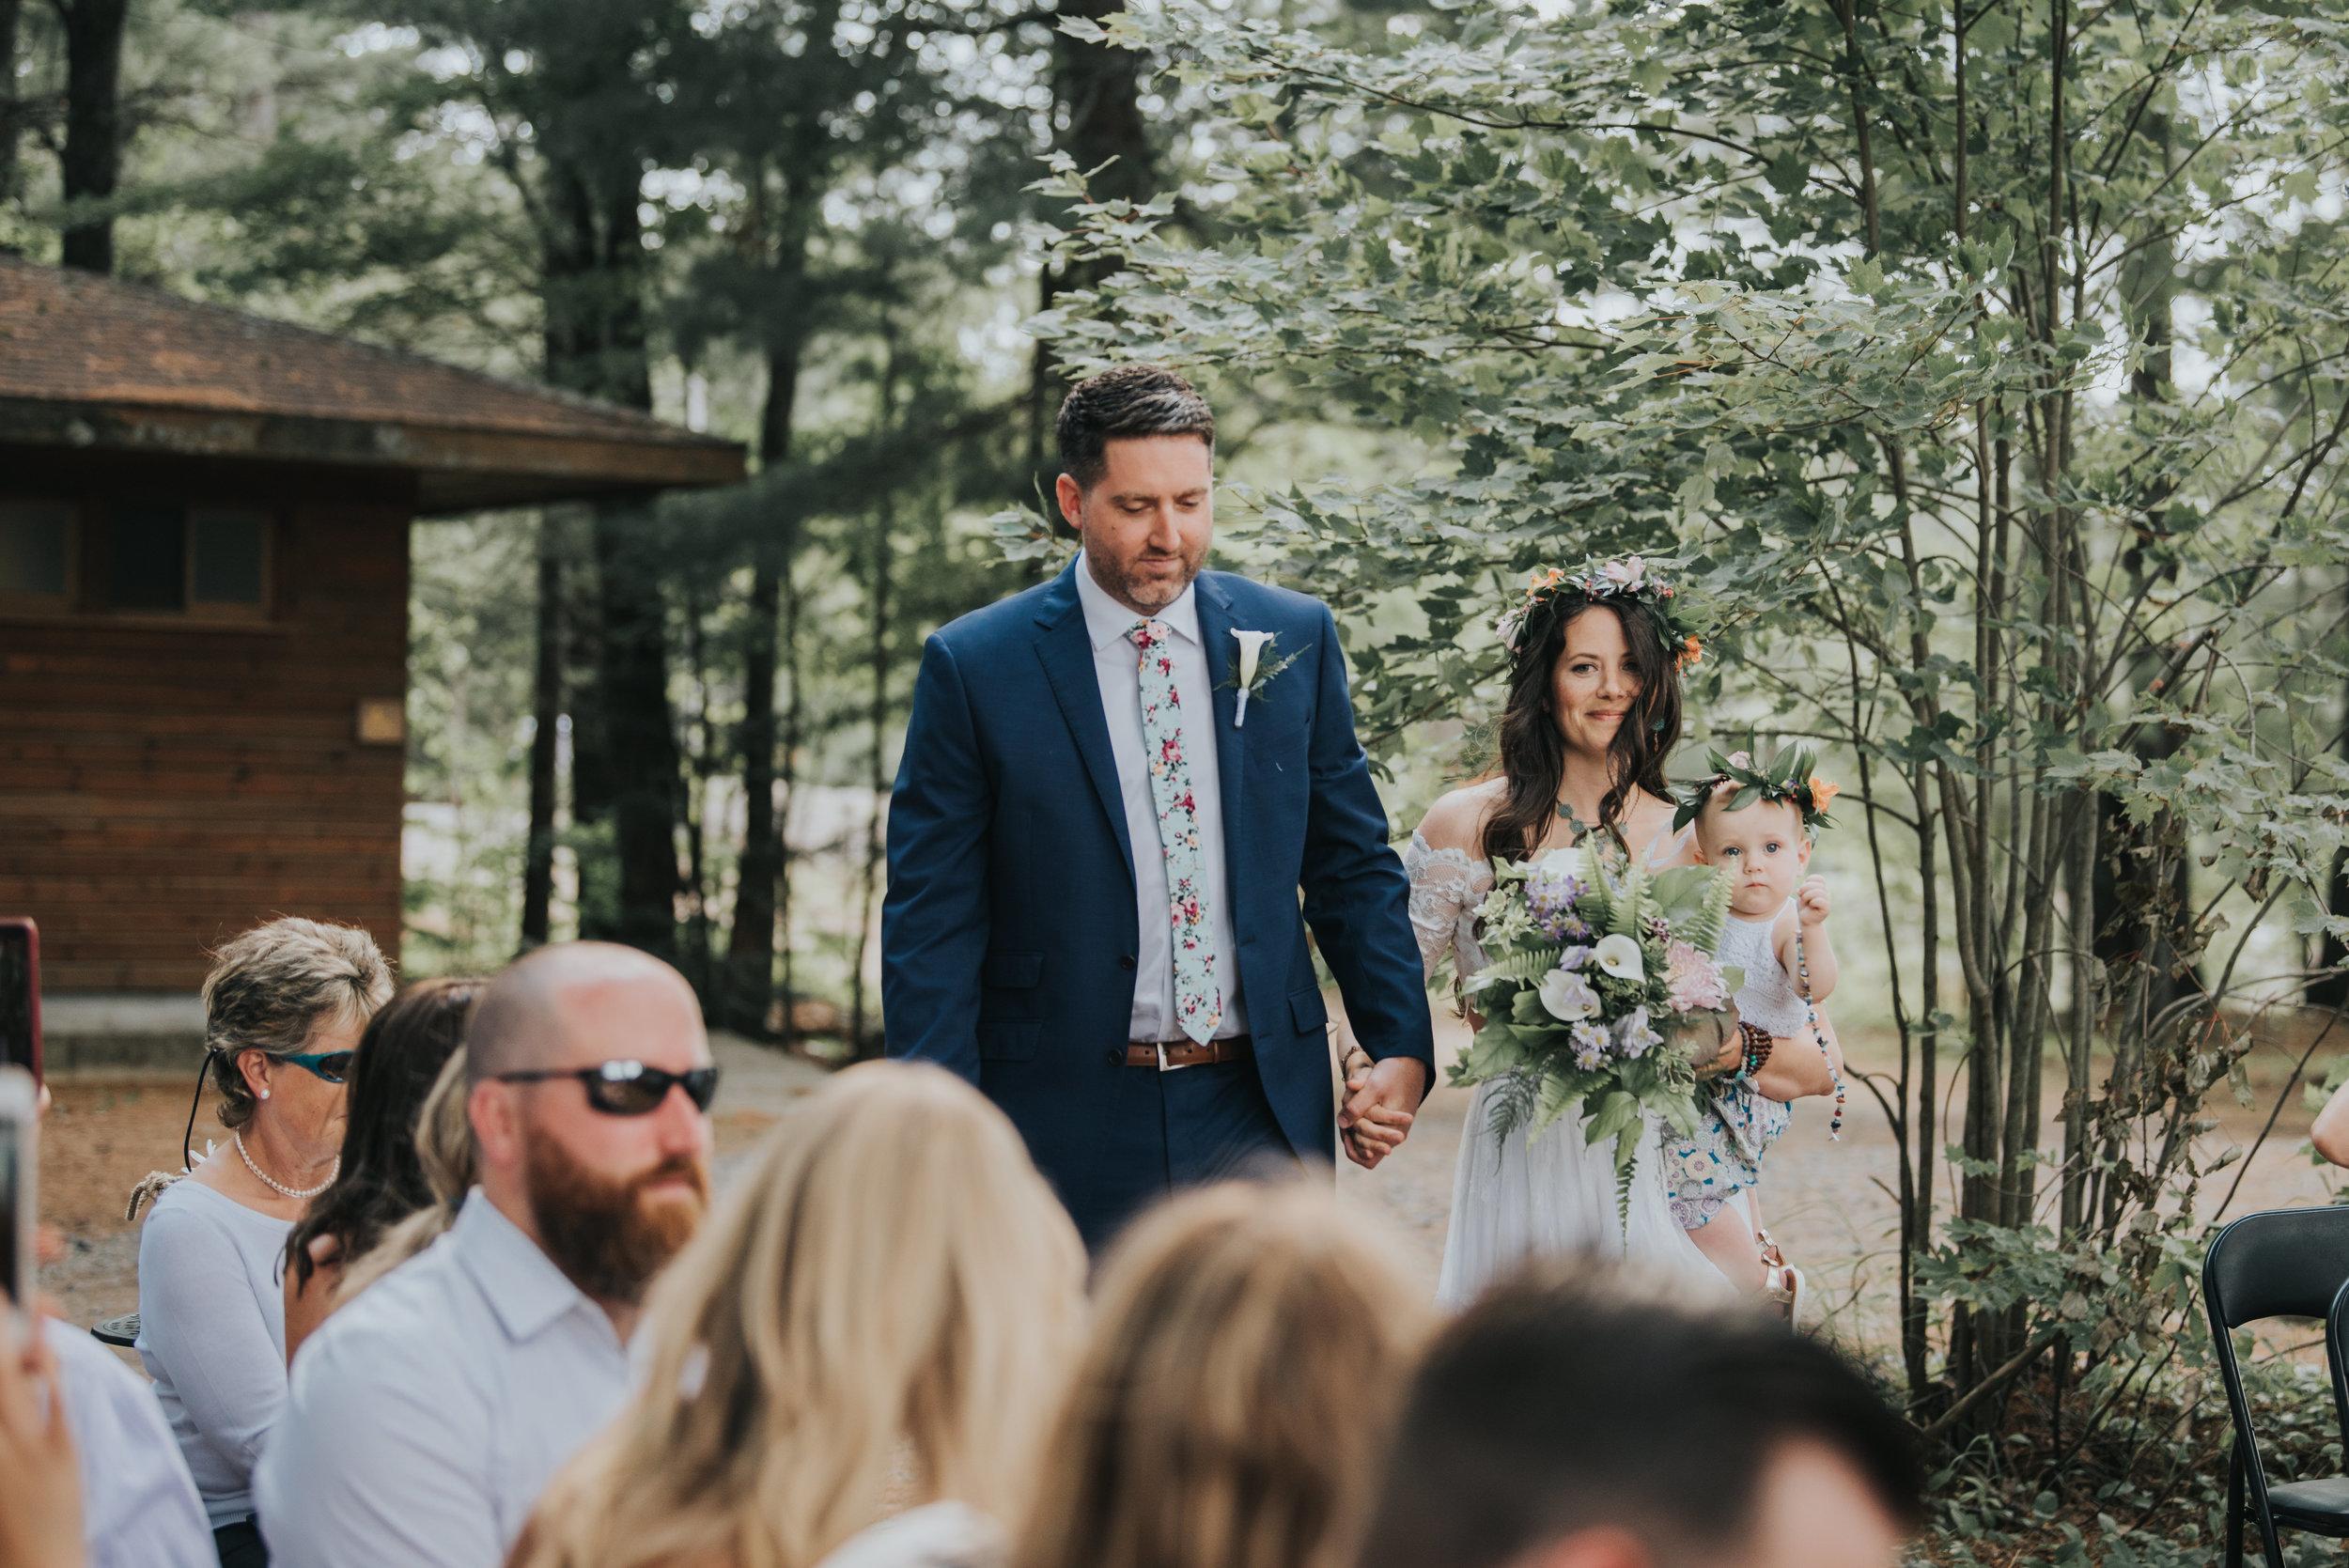 bride-and-groom-ceremony-toronto-bohemian-boho-outdoor-summer-wedding-documentary-wedding-photography-by-willow-birch-photo.jpg